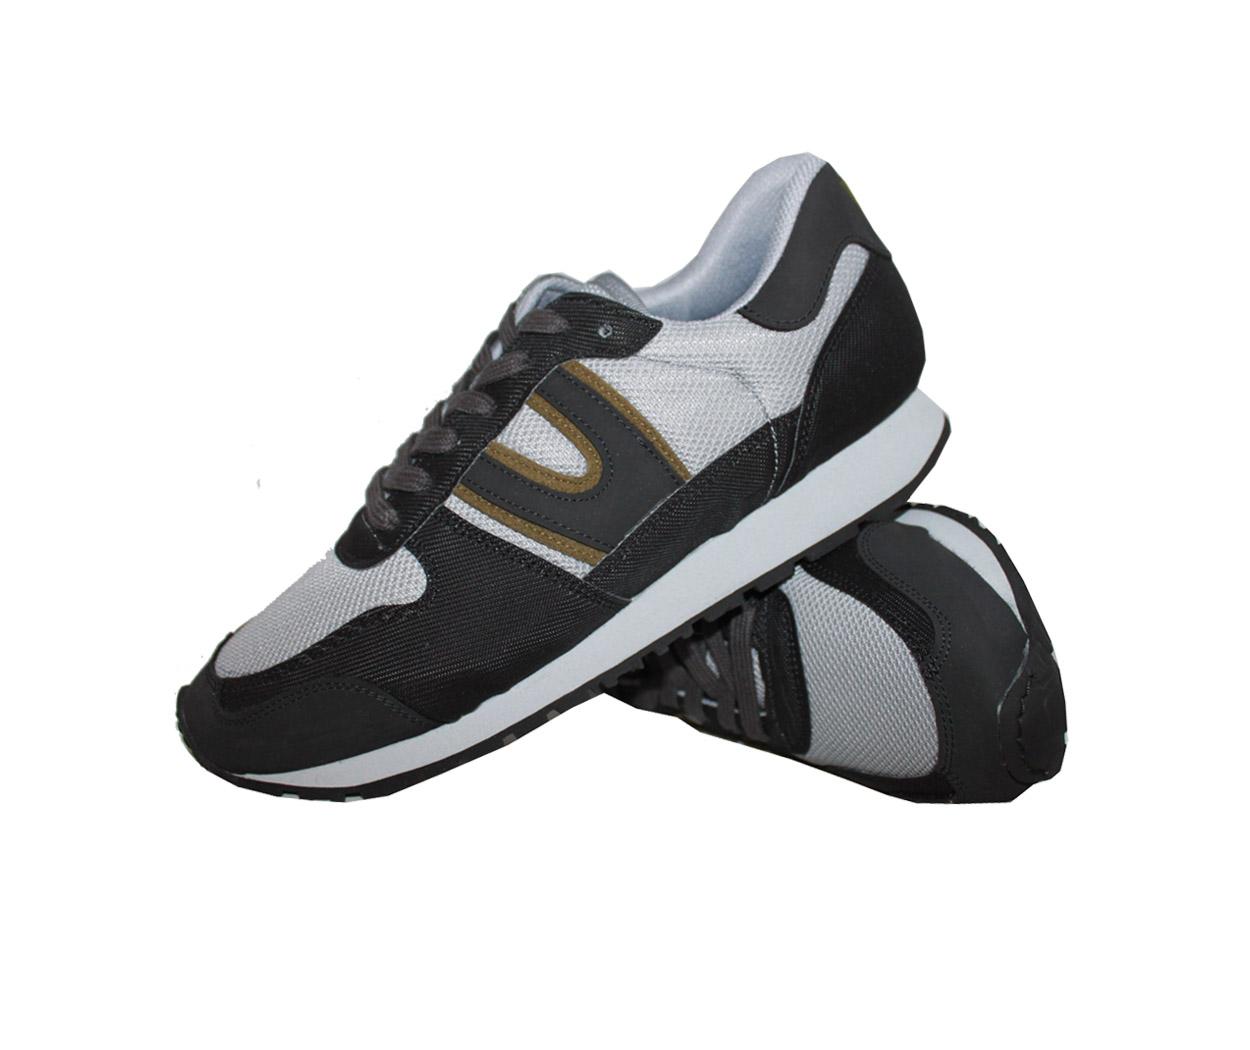 Chaussure trail vegan - Chaussures vegan esprit ...